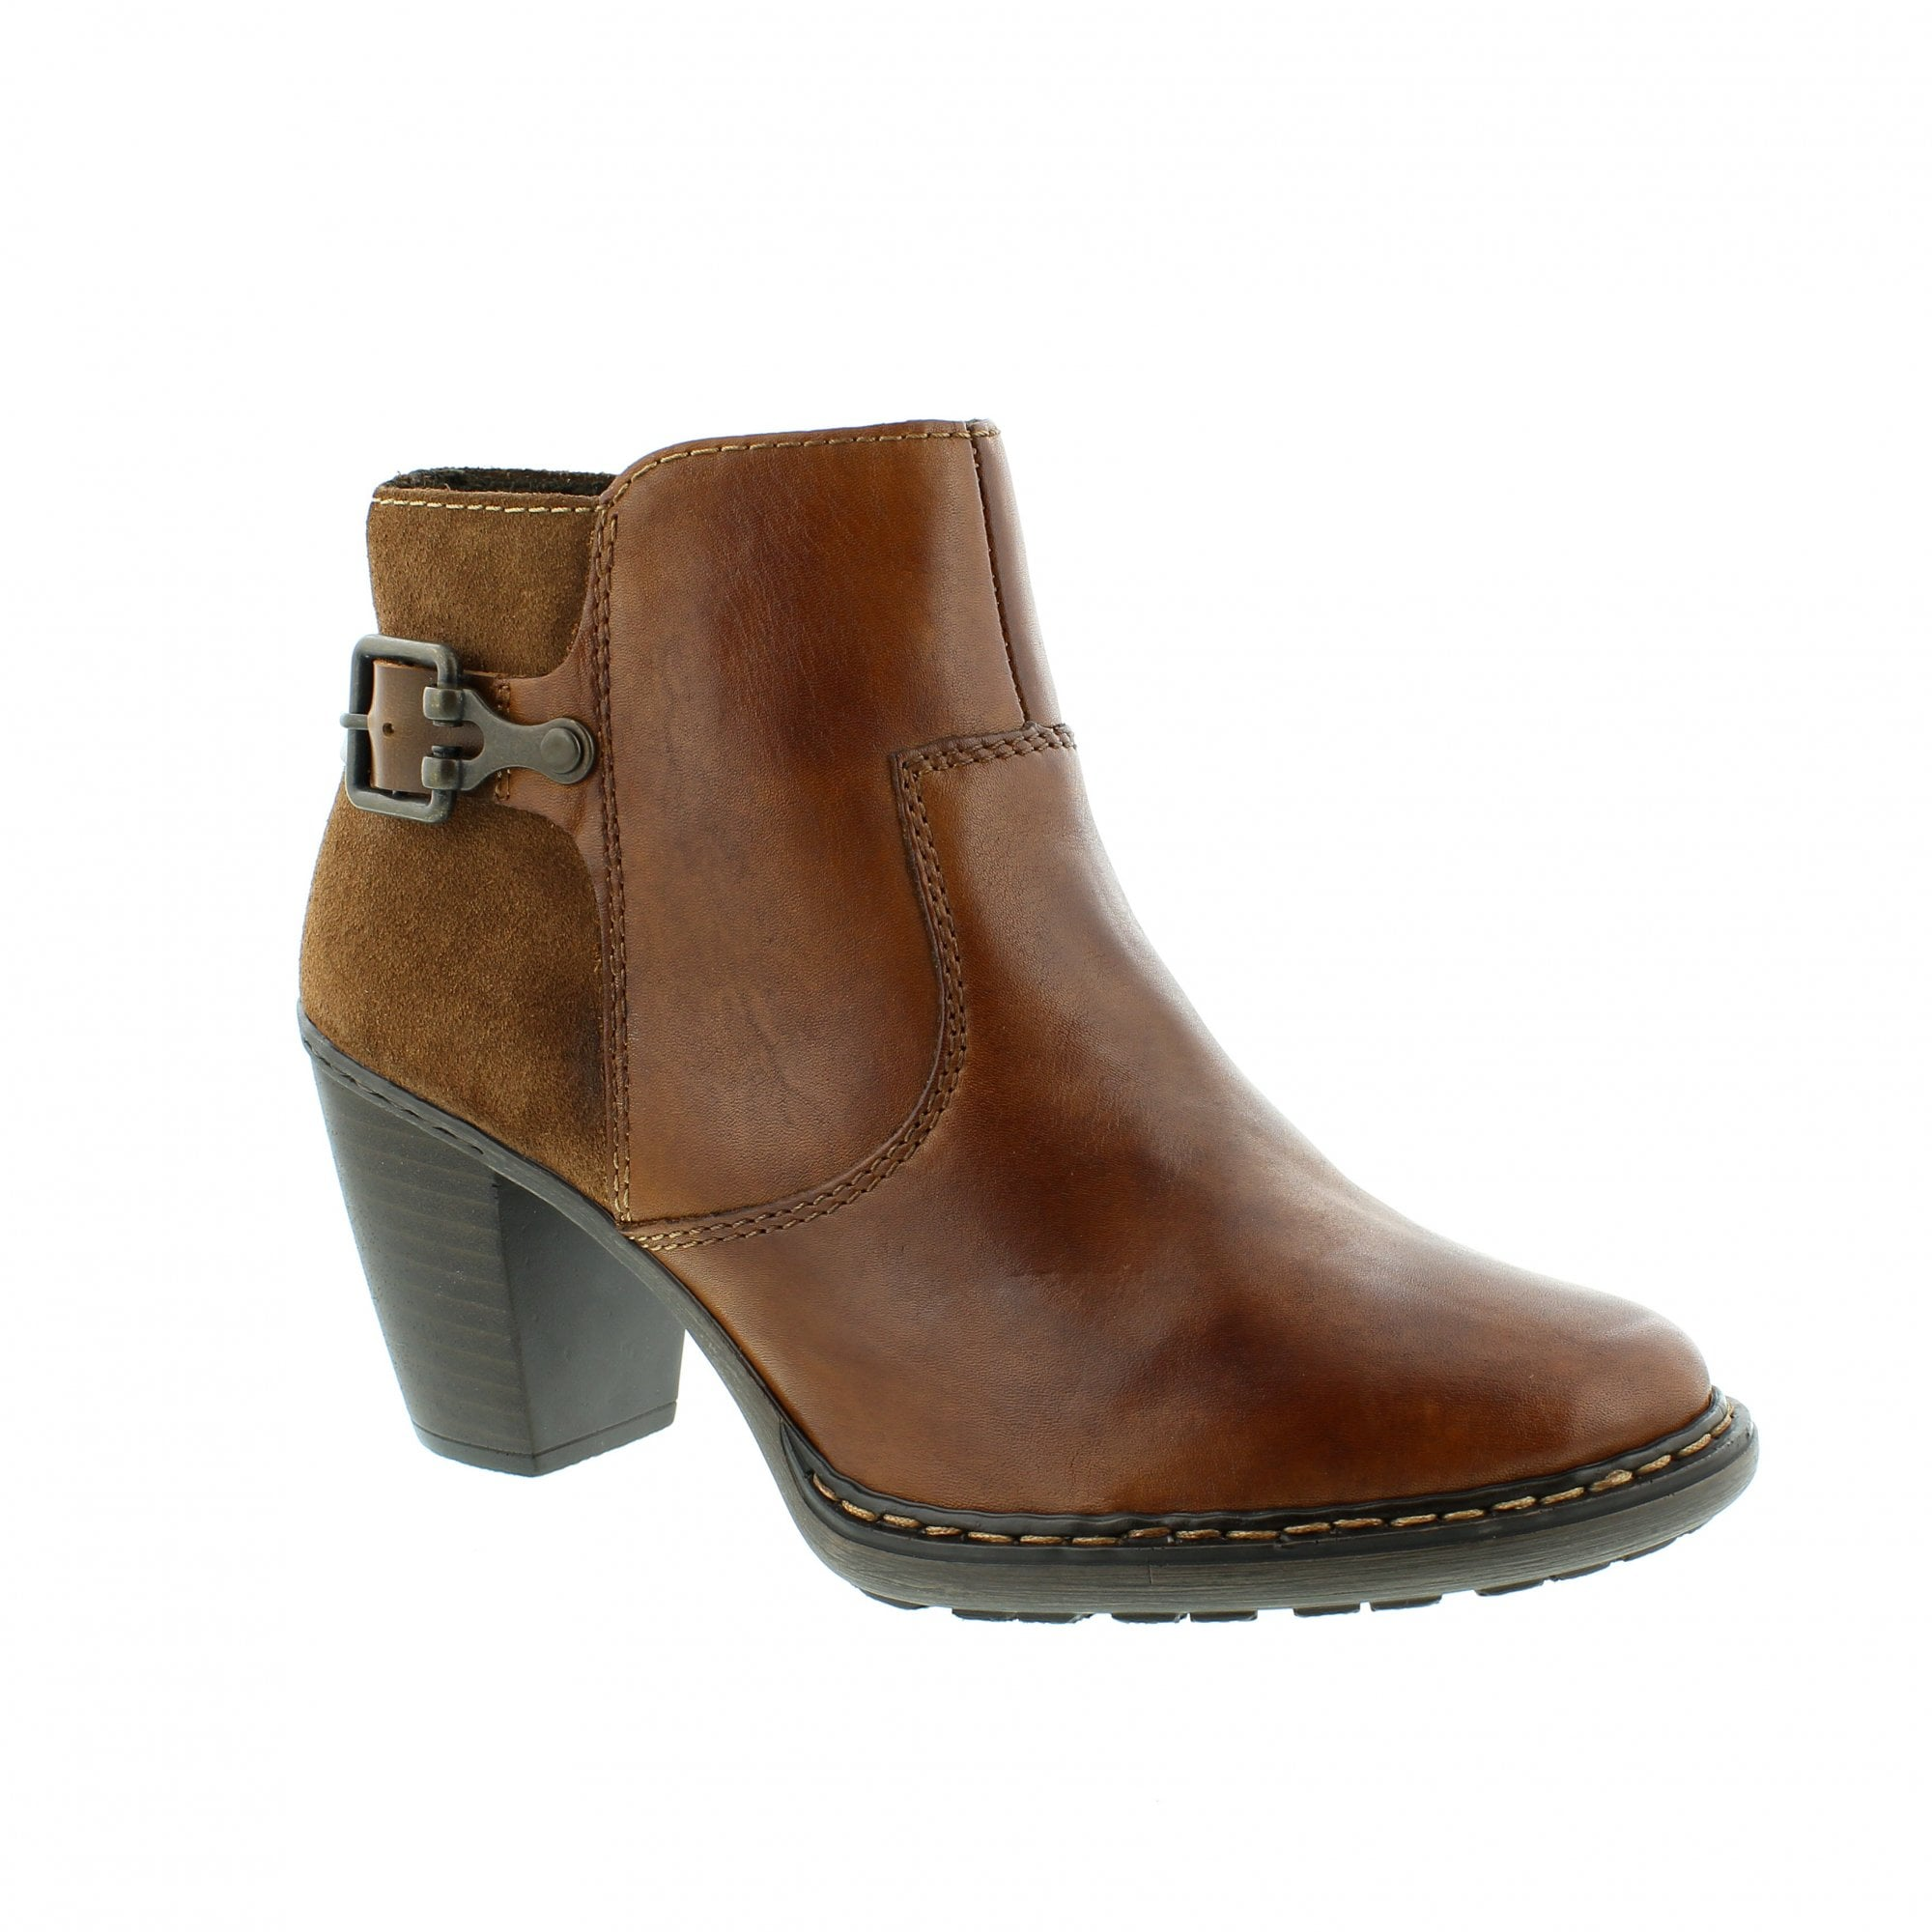 Rieker Women's 55292 Ankle Boots